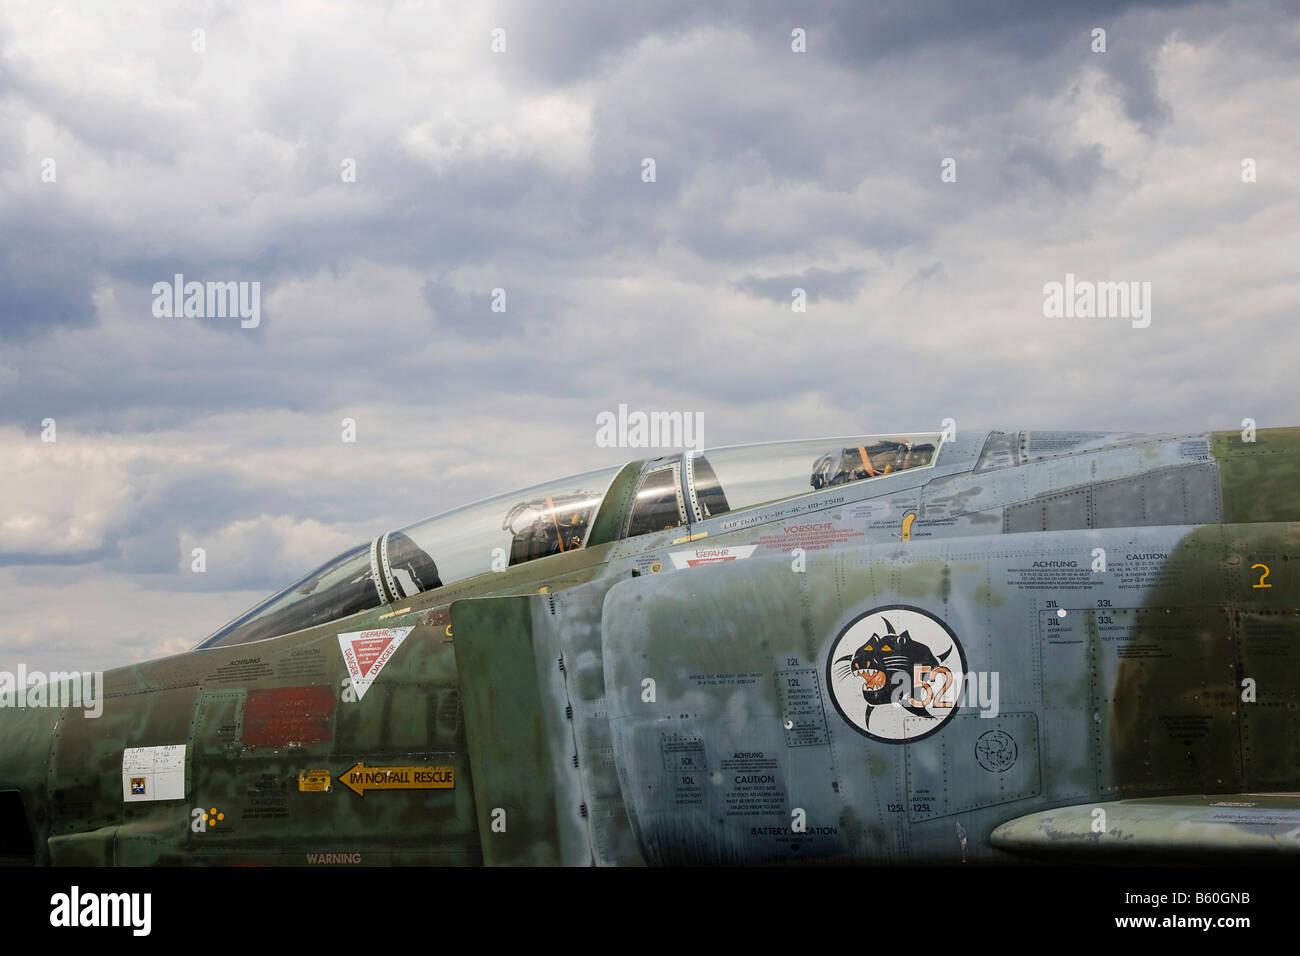 Cockpit of a McDonnell Douglas RF-4E Phantom II fighter plane - Stock Image